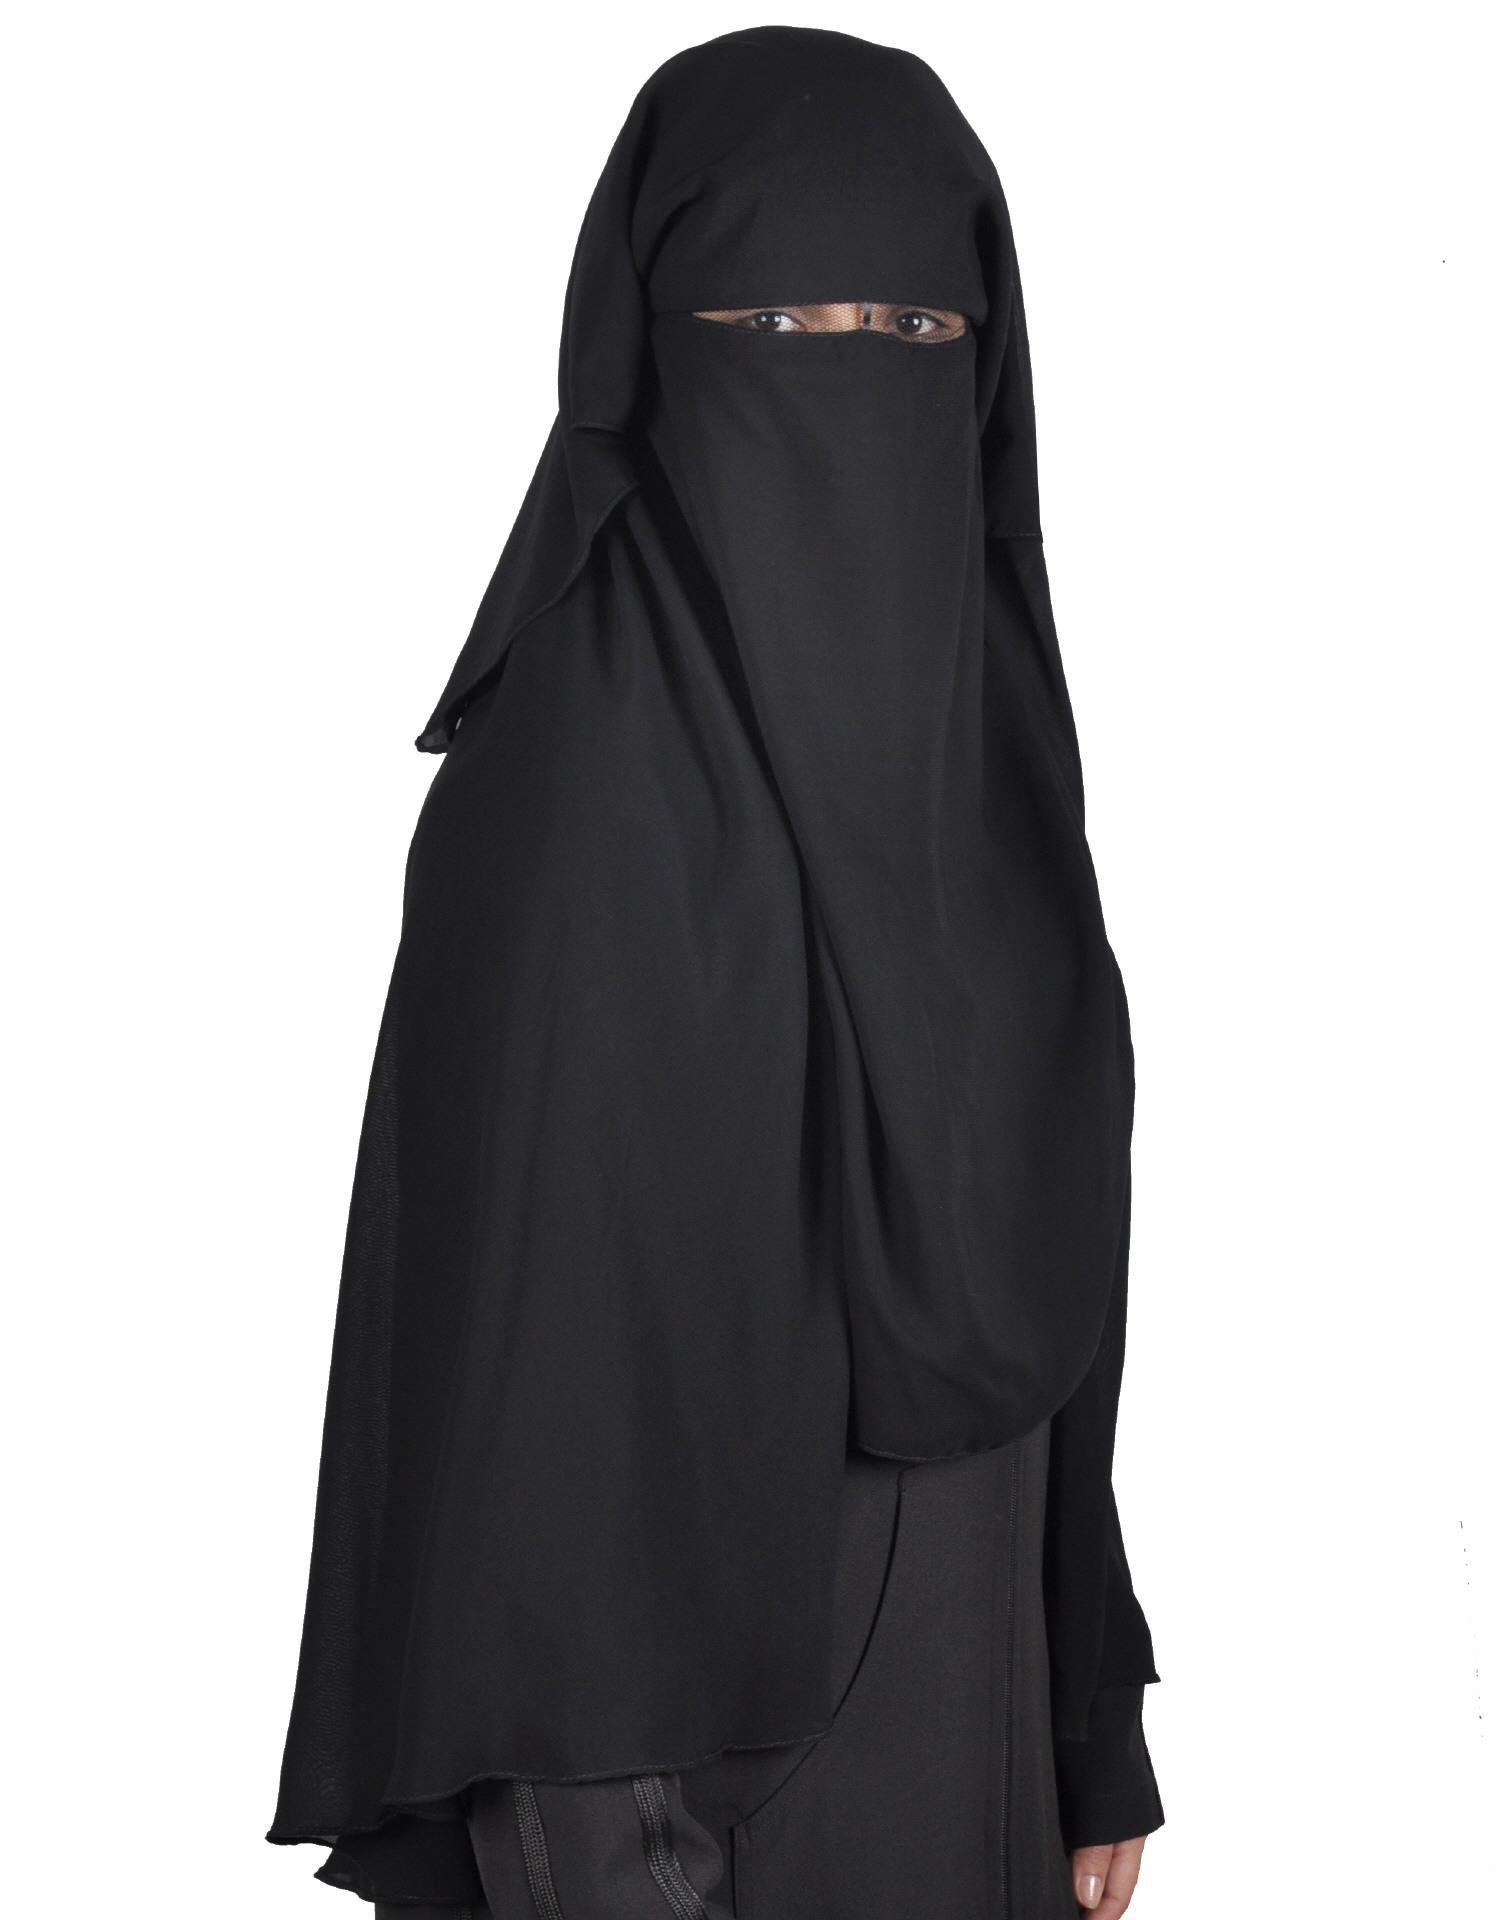 Niqab Schwarz Hijab Online Kaufen Egypt Bazar Shop